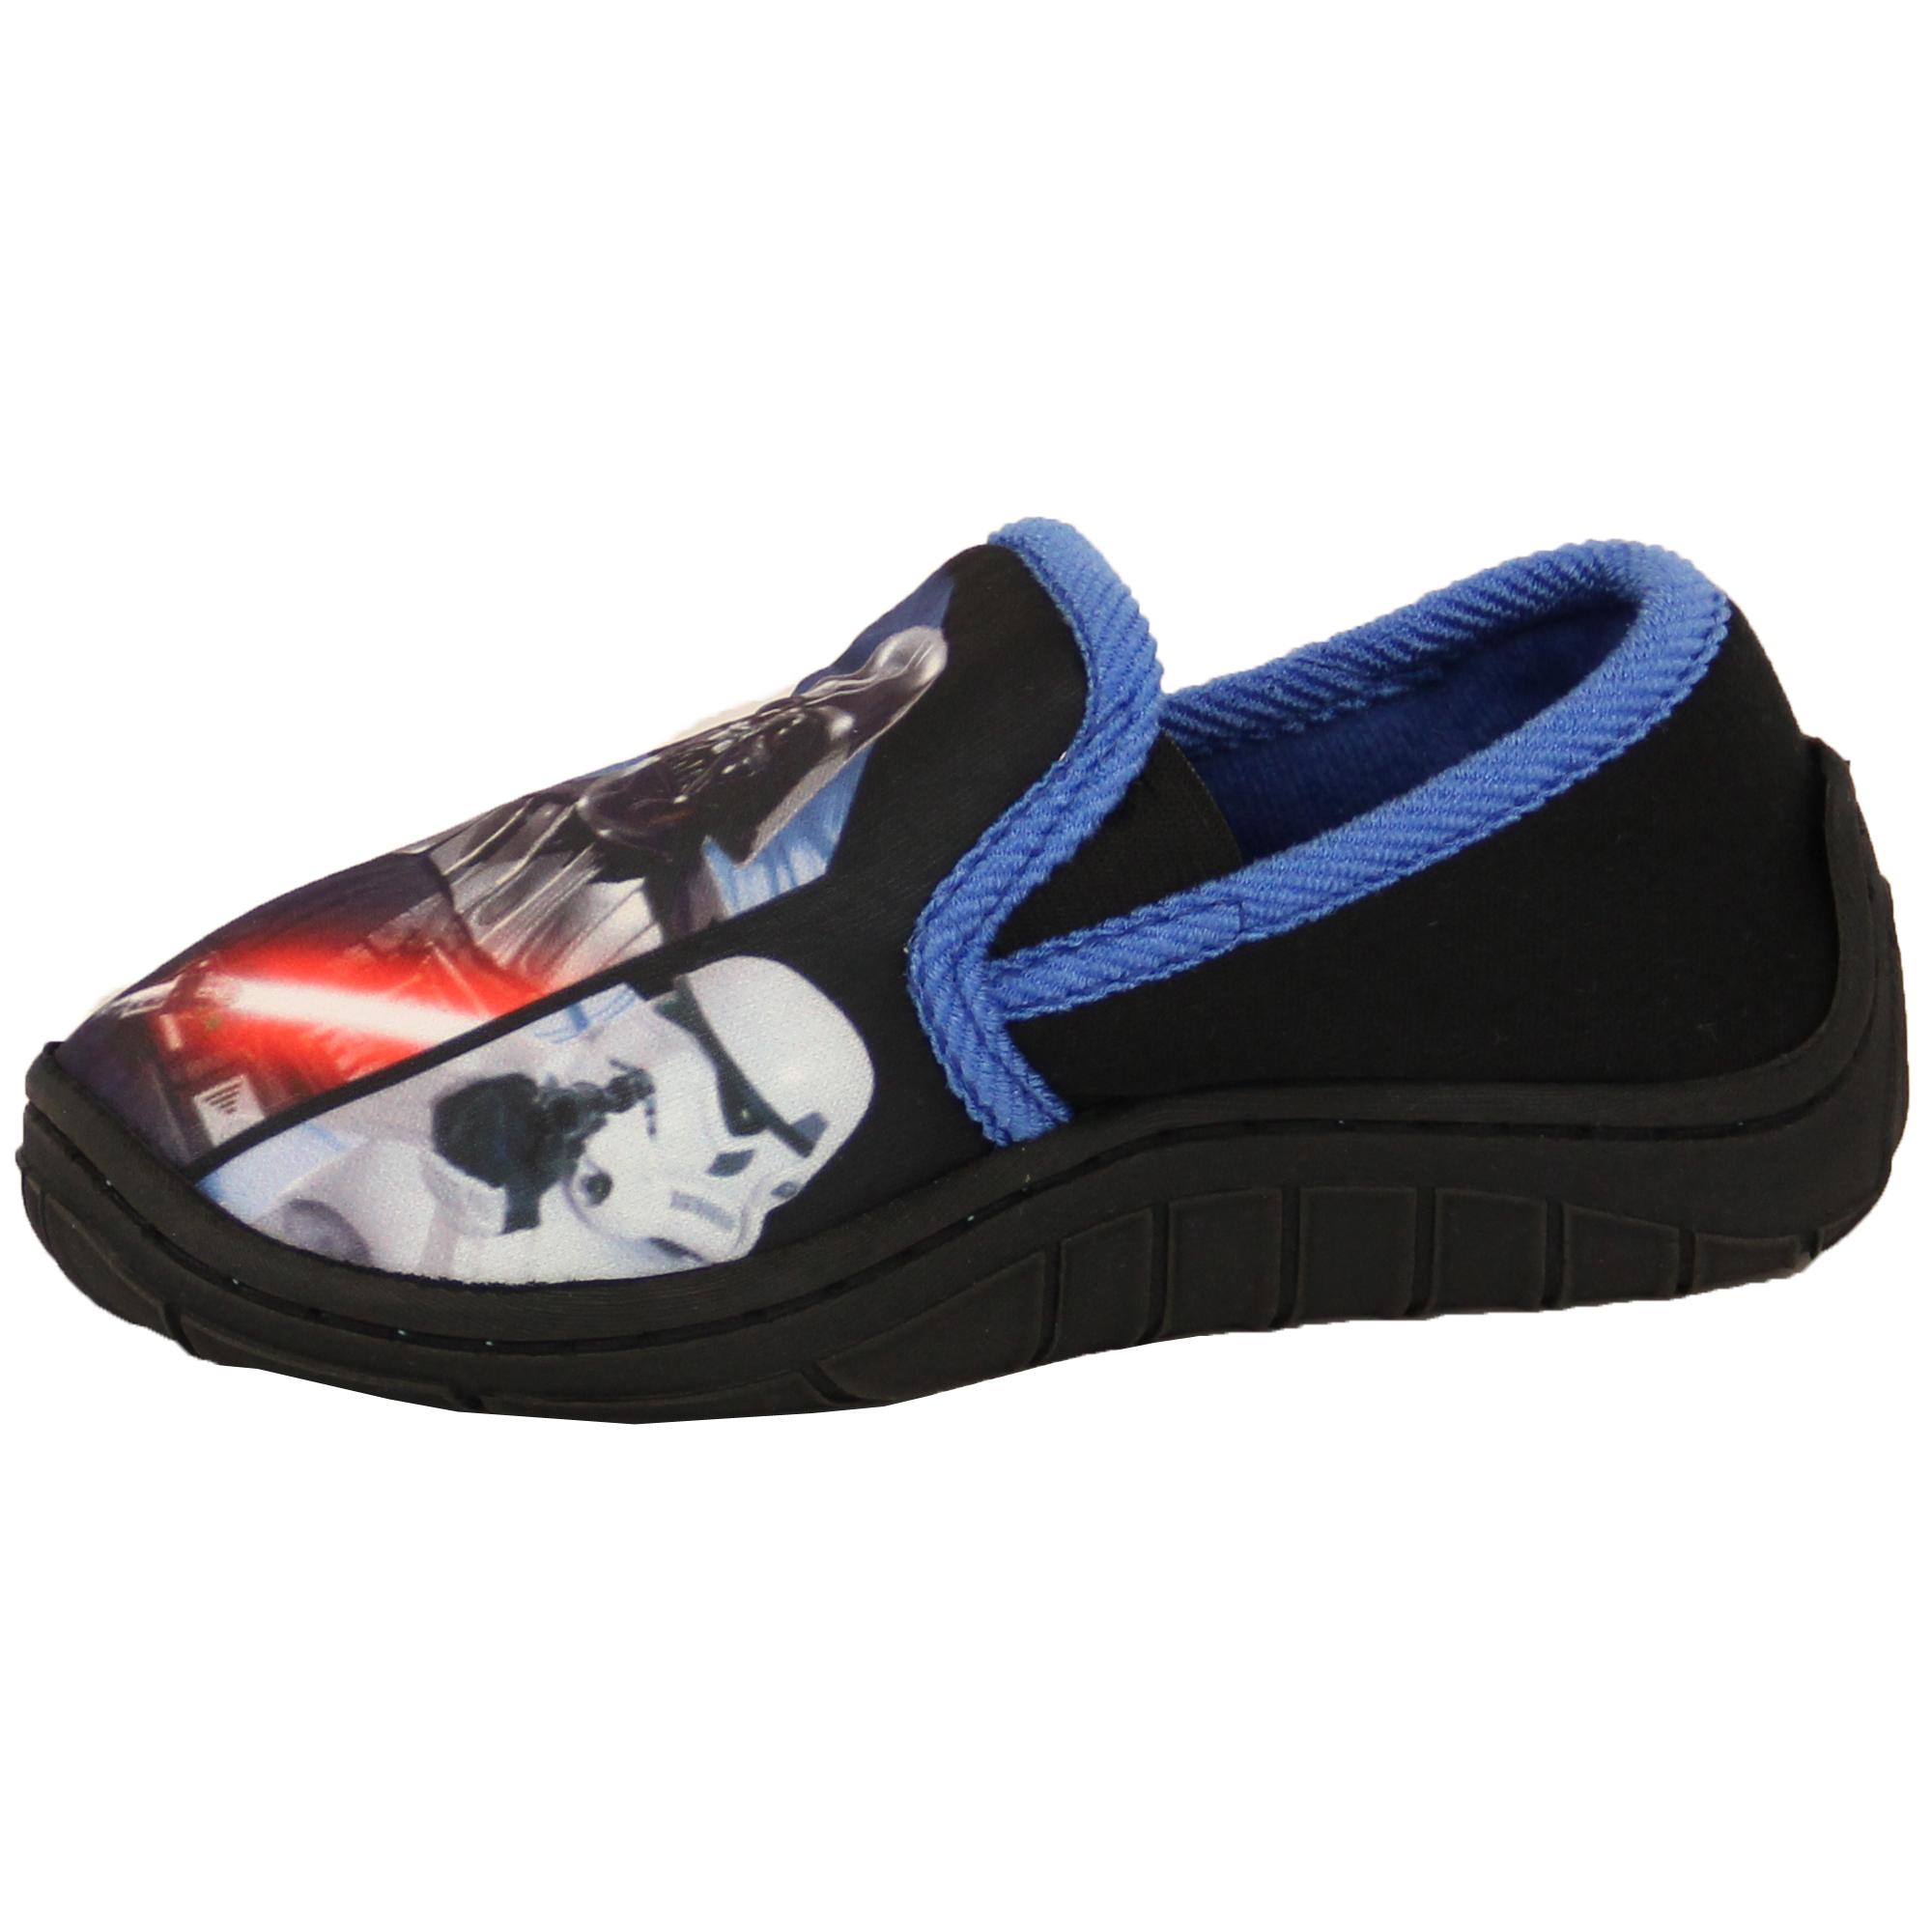 Boys-Girls-Shoes-Minion-Kids-Trainers-Star-Wars-Disney-Spiderman-Slipper thumbnail 11